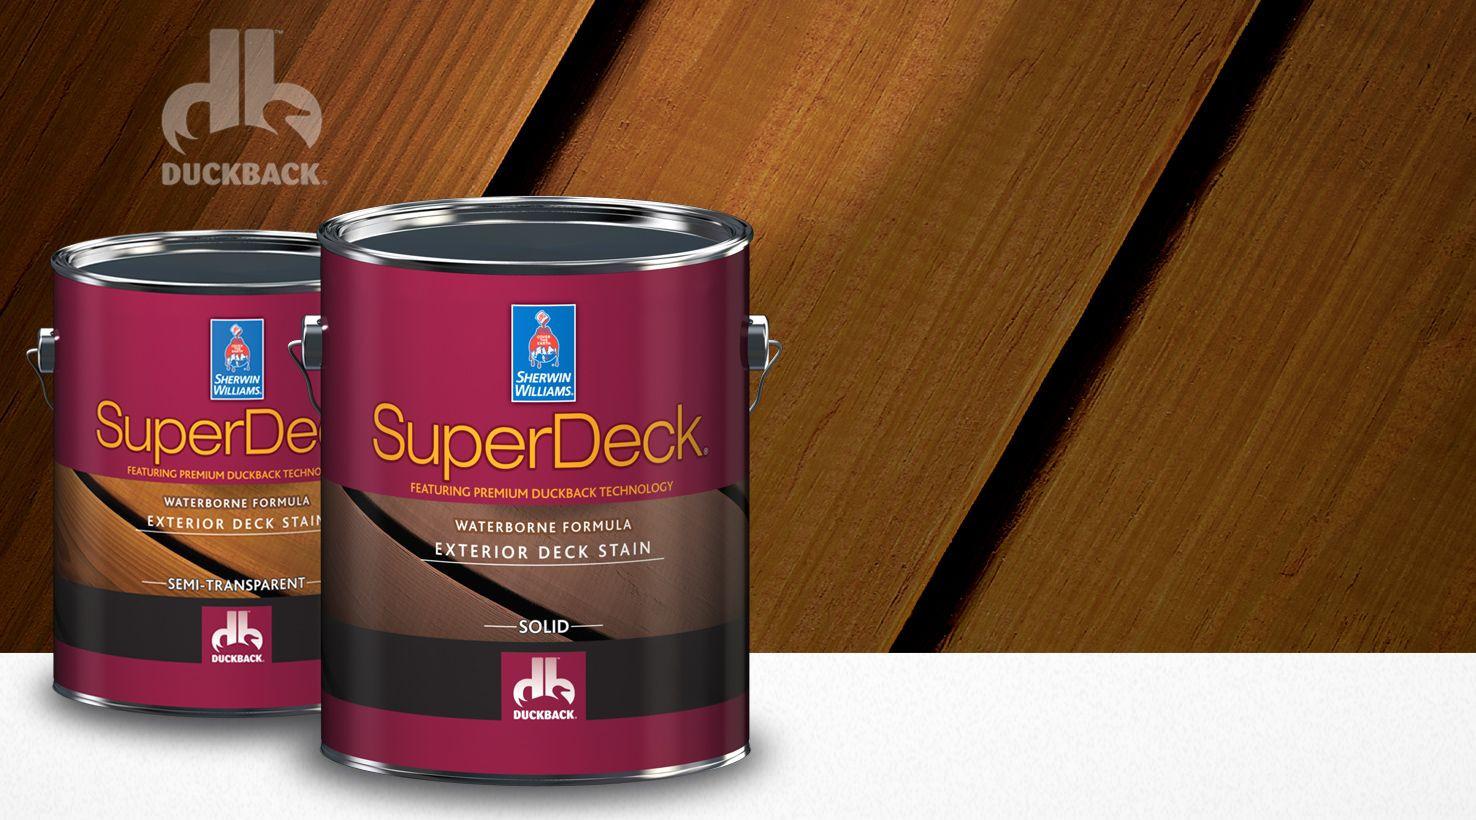 Cool Deck Paint Sherwin Williams  SuperDeck featuring premium Duckback Technology from